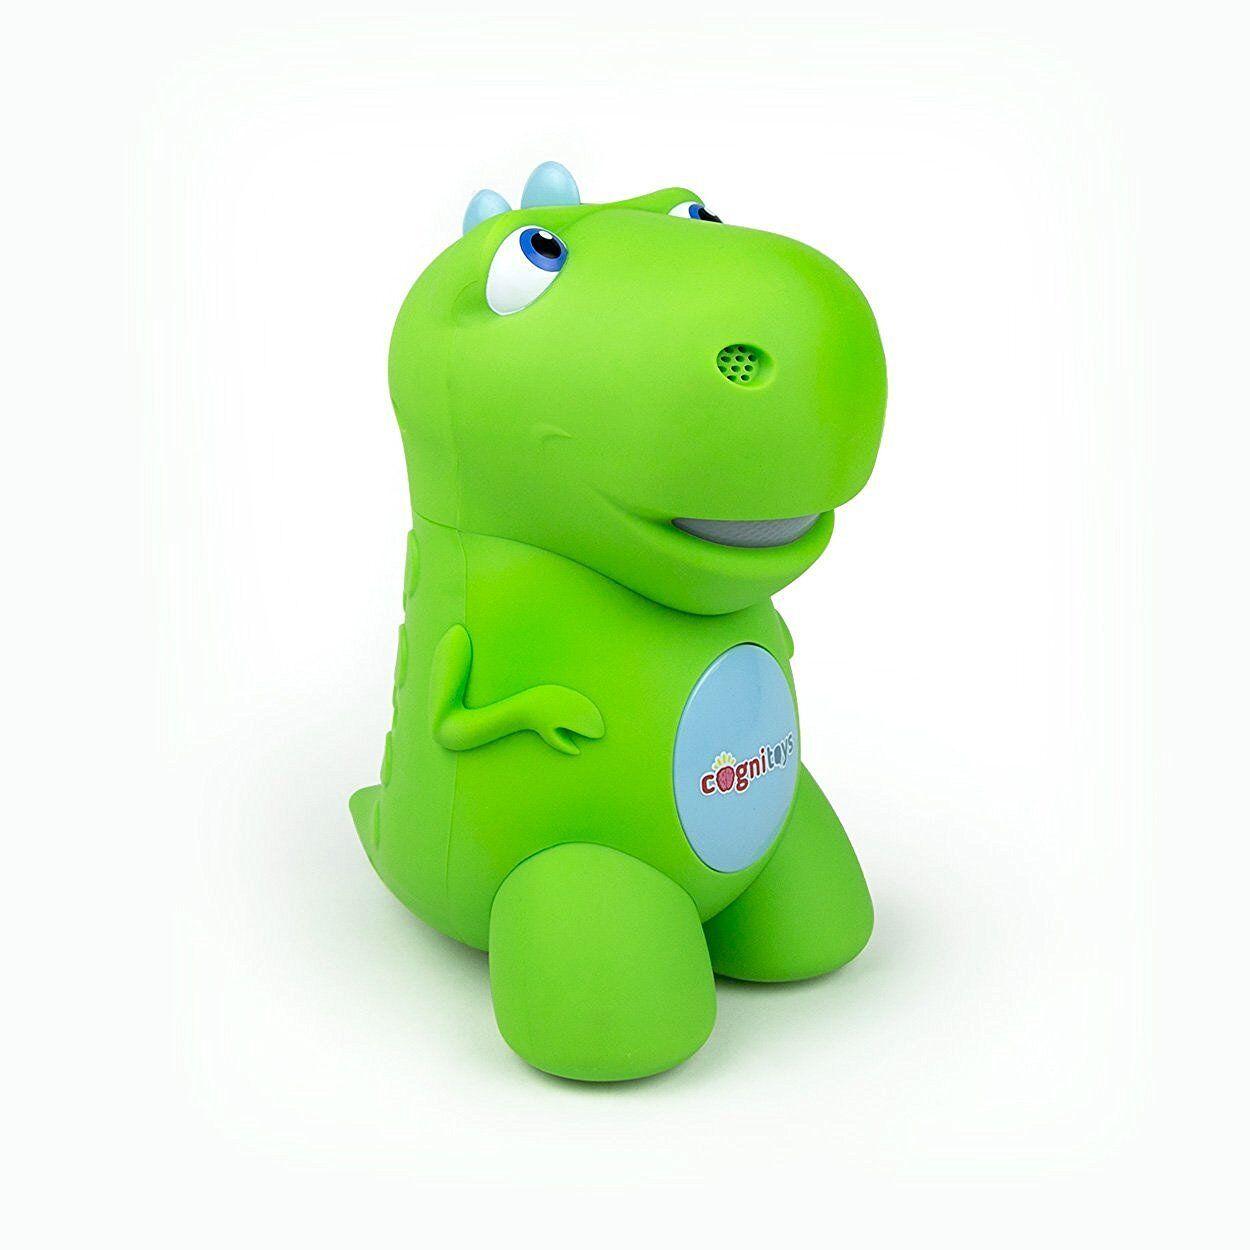 Cognitileksaker Dino ungar Cognitive Electronic Learning leksak fri Shipping ORIGINAL New